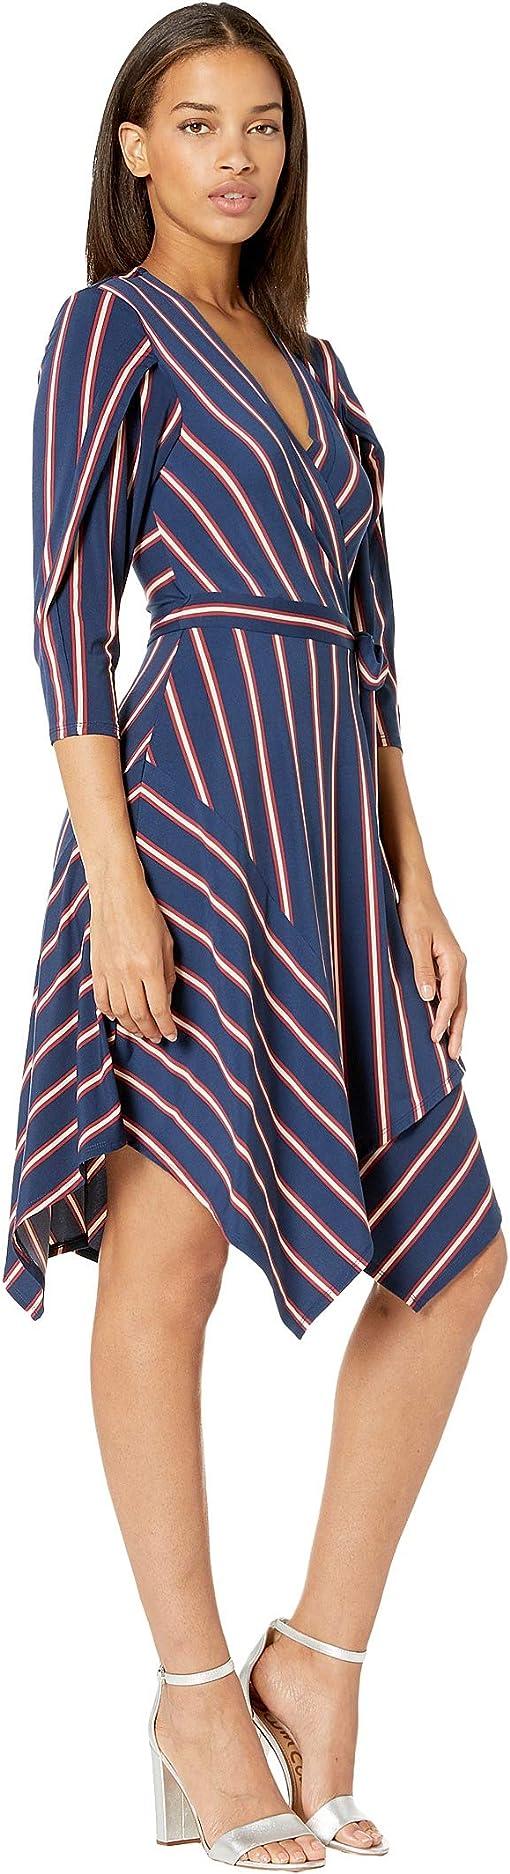 Pacific Blue/Valet Stripe